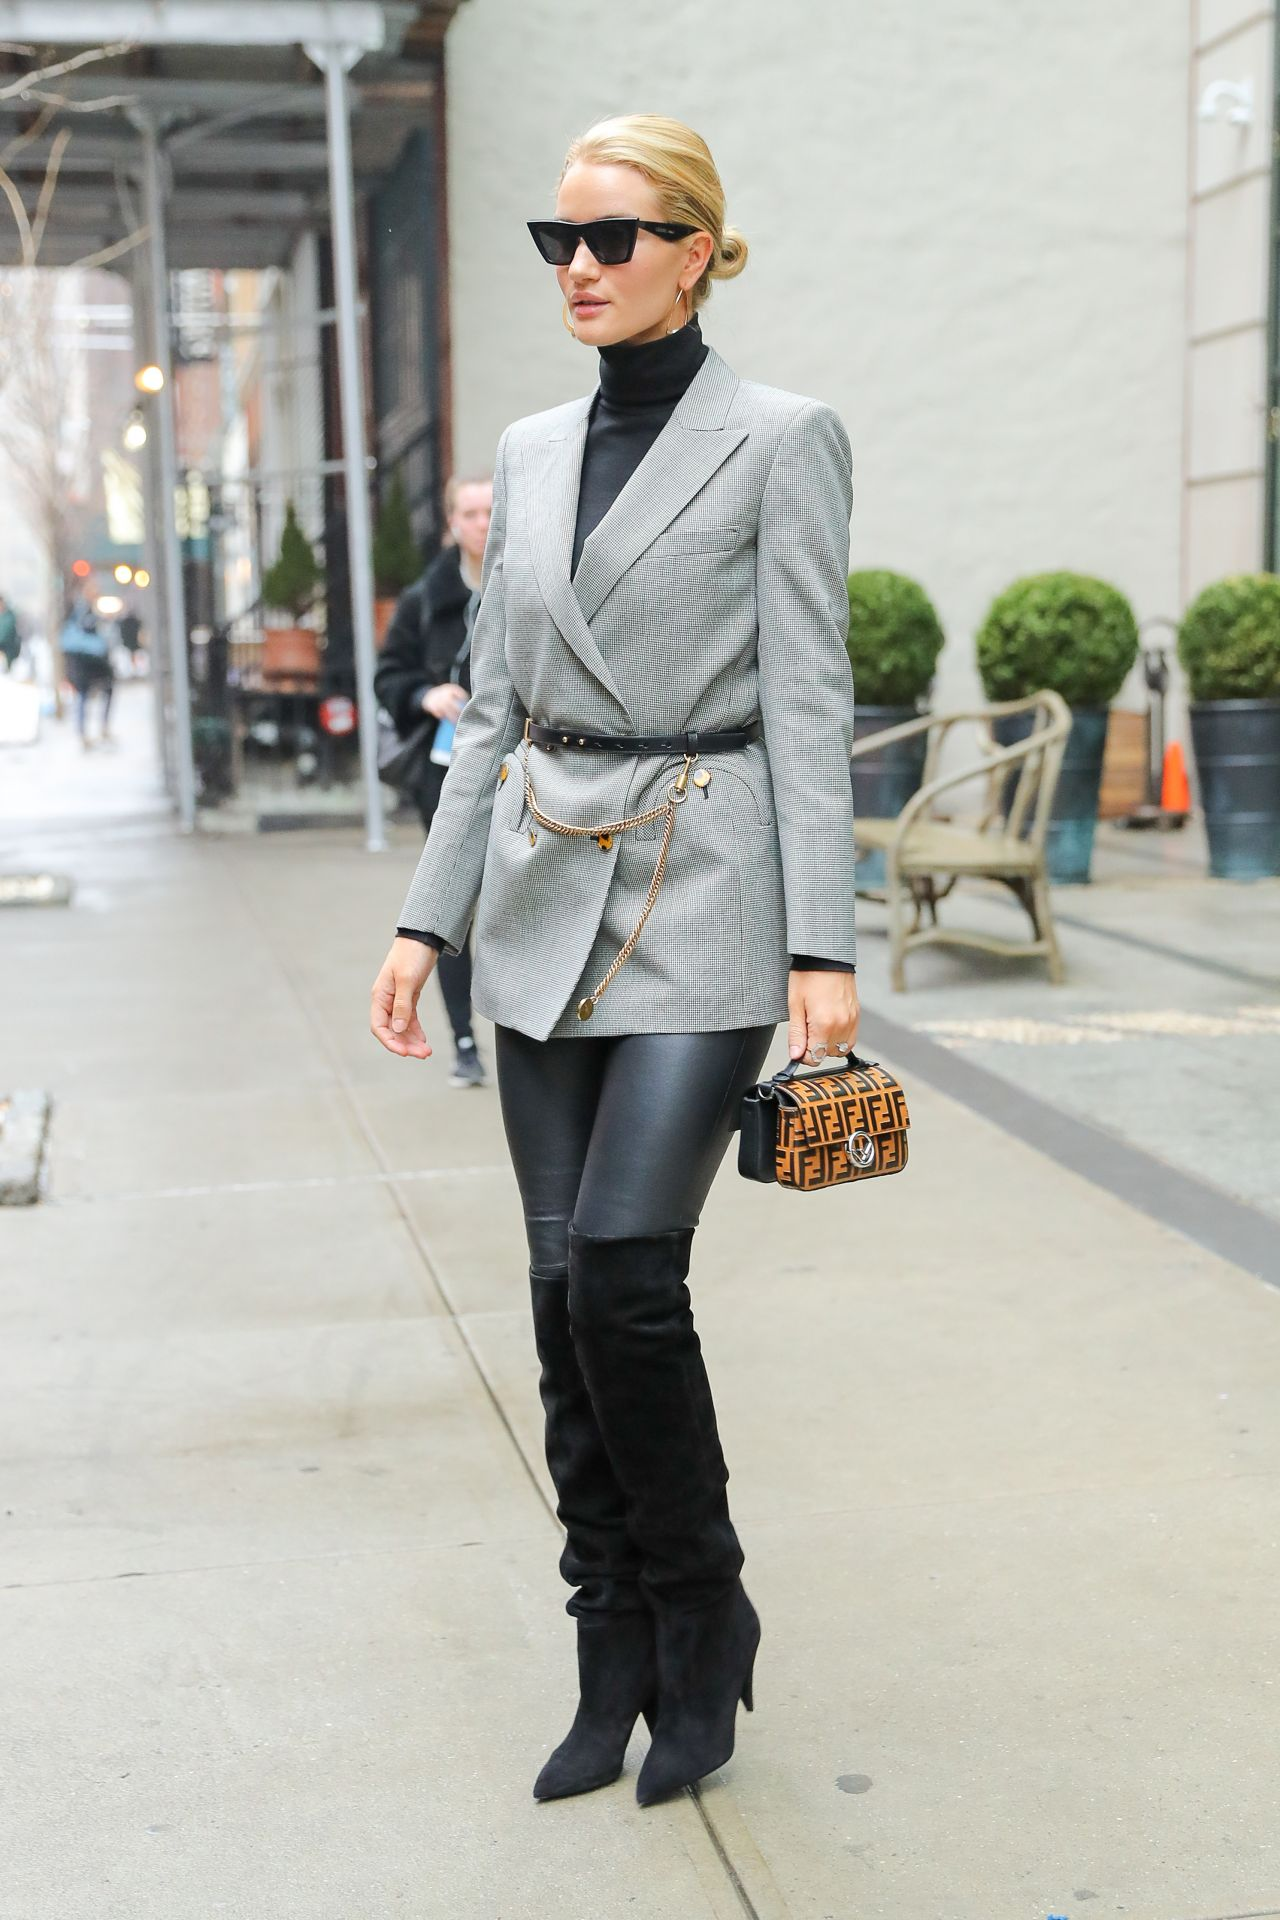 Rosie Huntington Whiteley Fashion Style New York City 04 04 2018